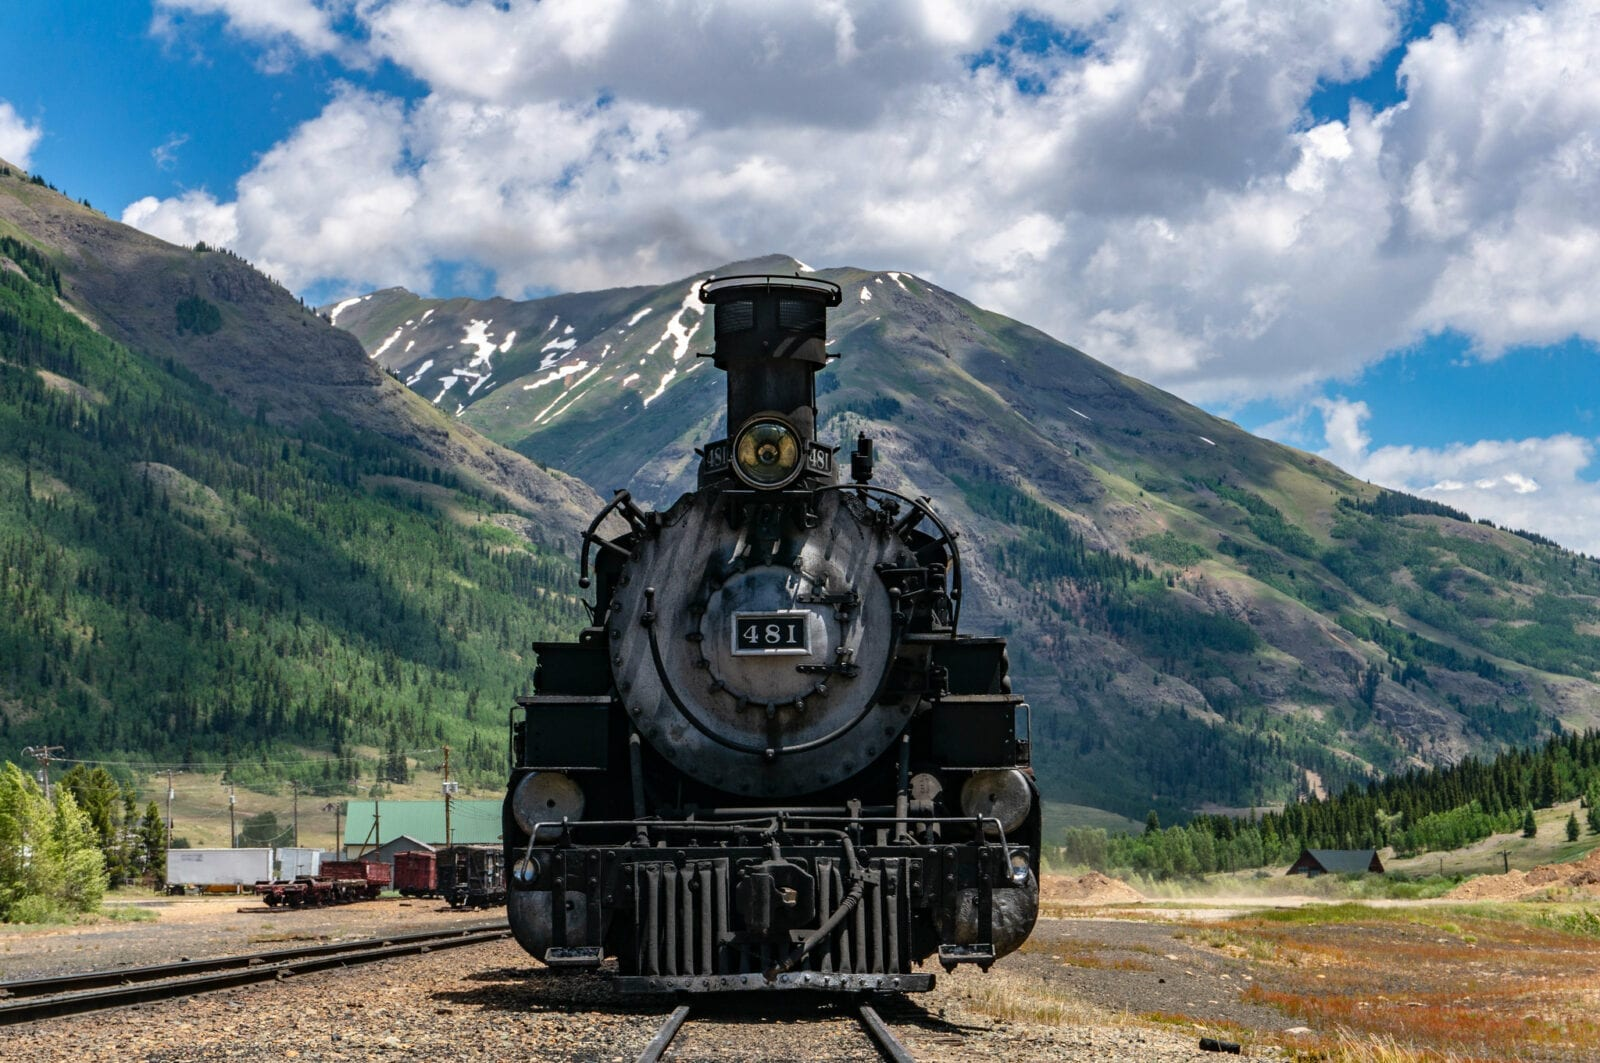 image of the Durango and Silverton train